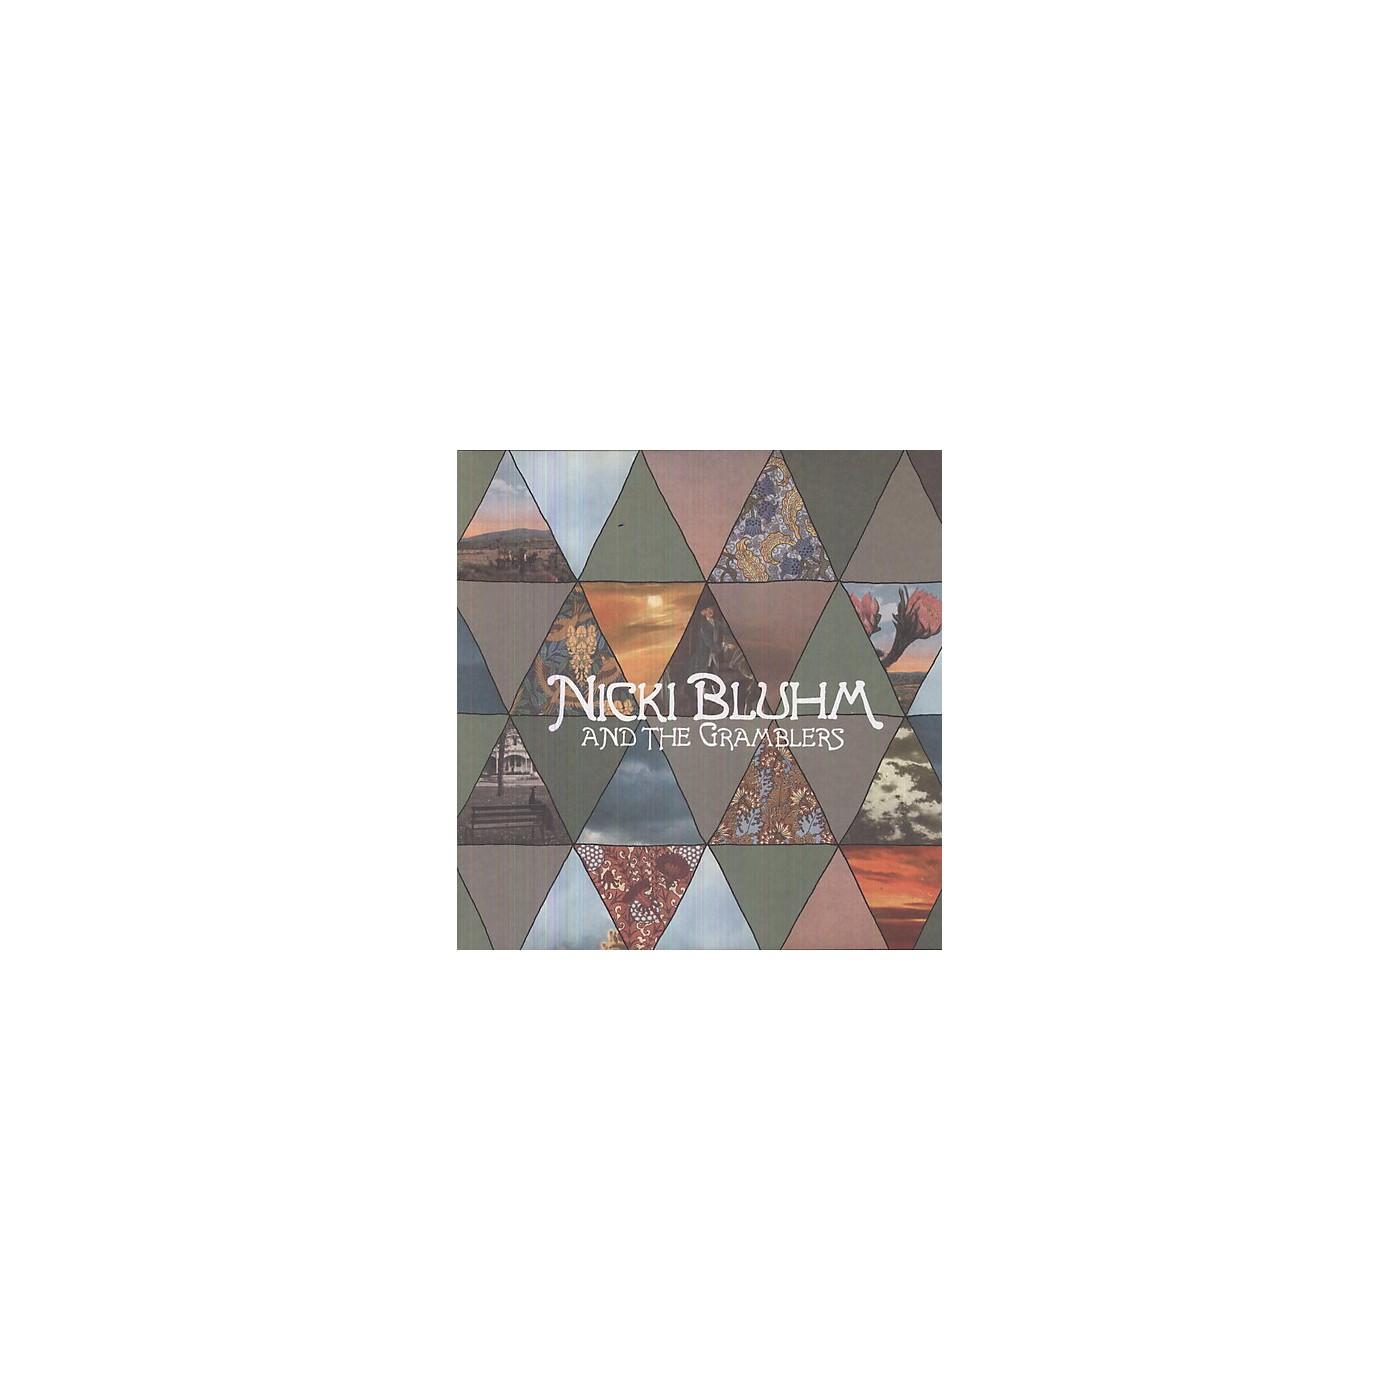 Alliance Nicki Bluhm - Nicki Bluhm and The Gramblers thumbnail